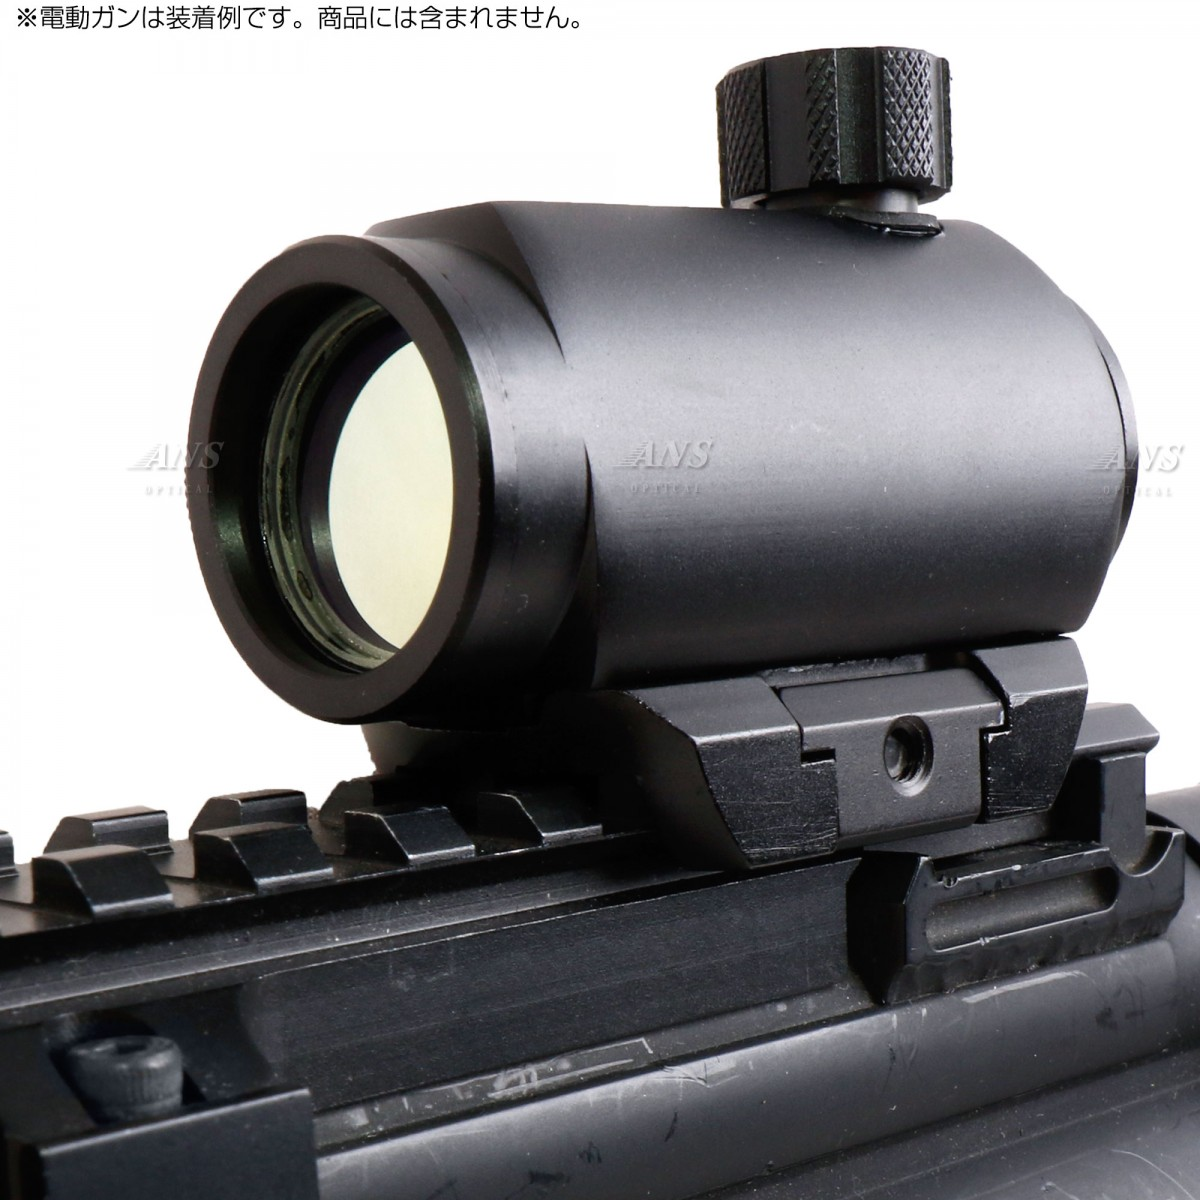 AIM MICRO T-1 ドットサイト HD22M1 BK 調光タイプ